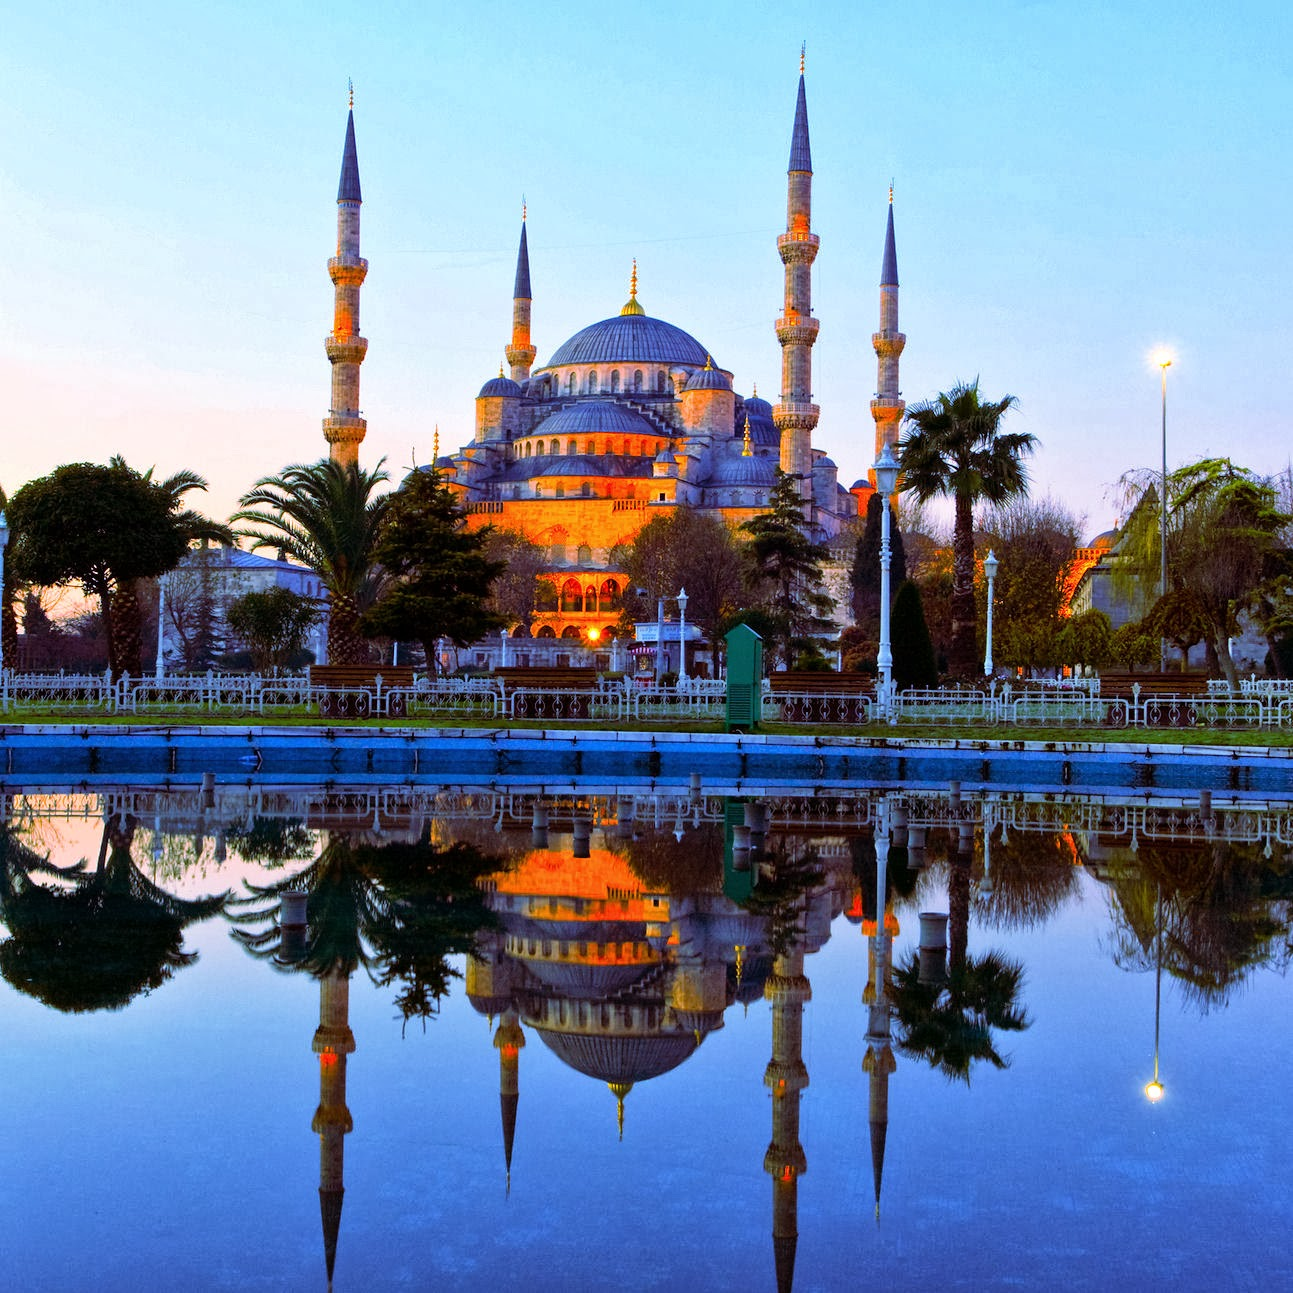 Blue Mosque Istanbul Turkey Wallpaper Umroh Malang Paket Umrah Beautiful